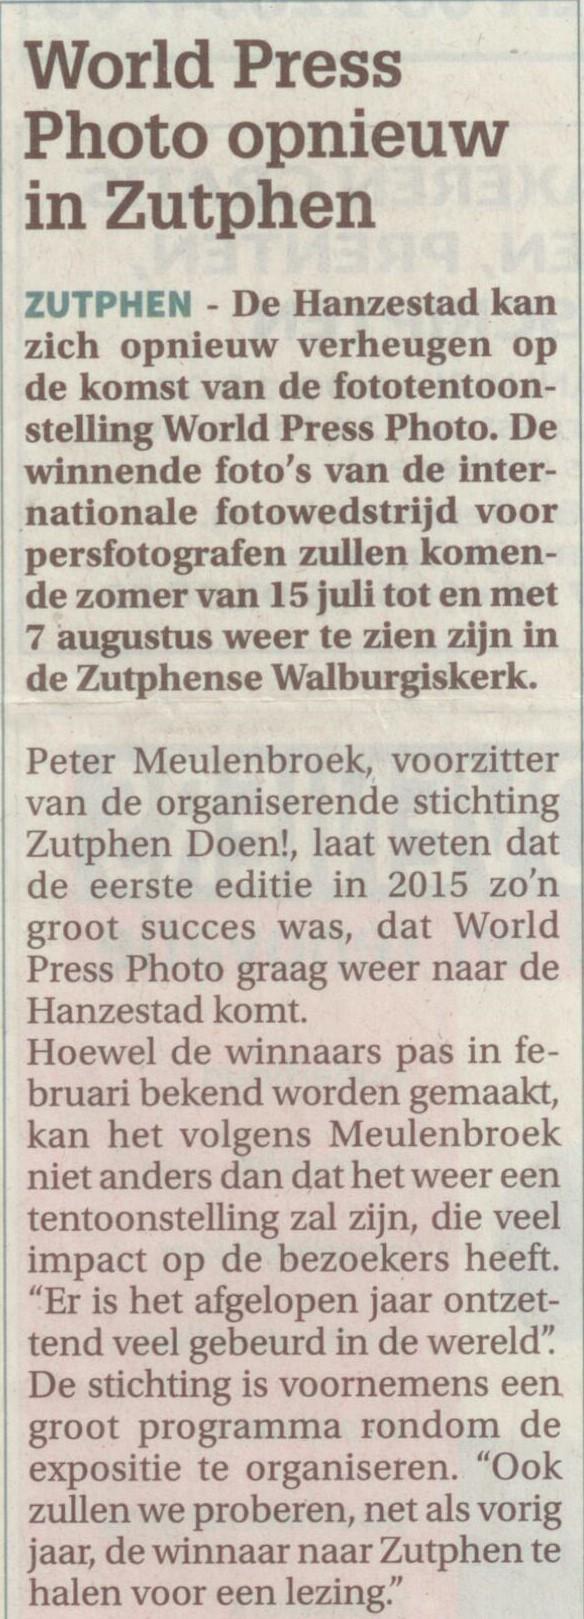 160128 Contact World Press Photo opnieuw in Zutphen